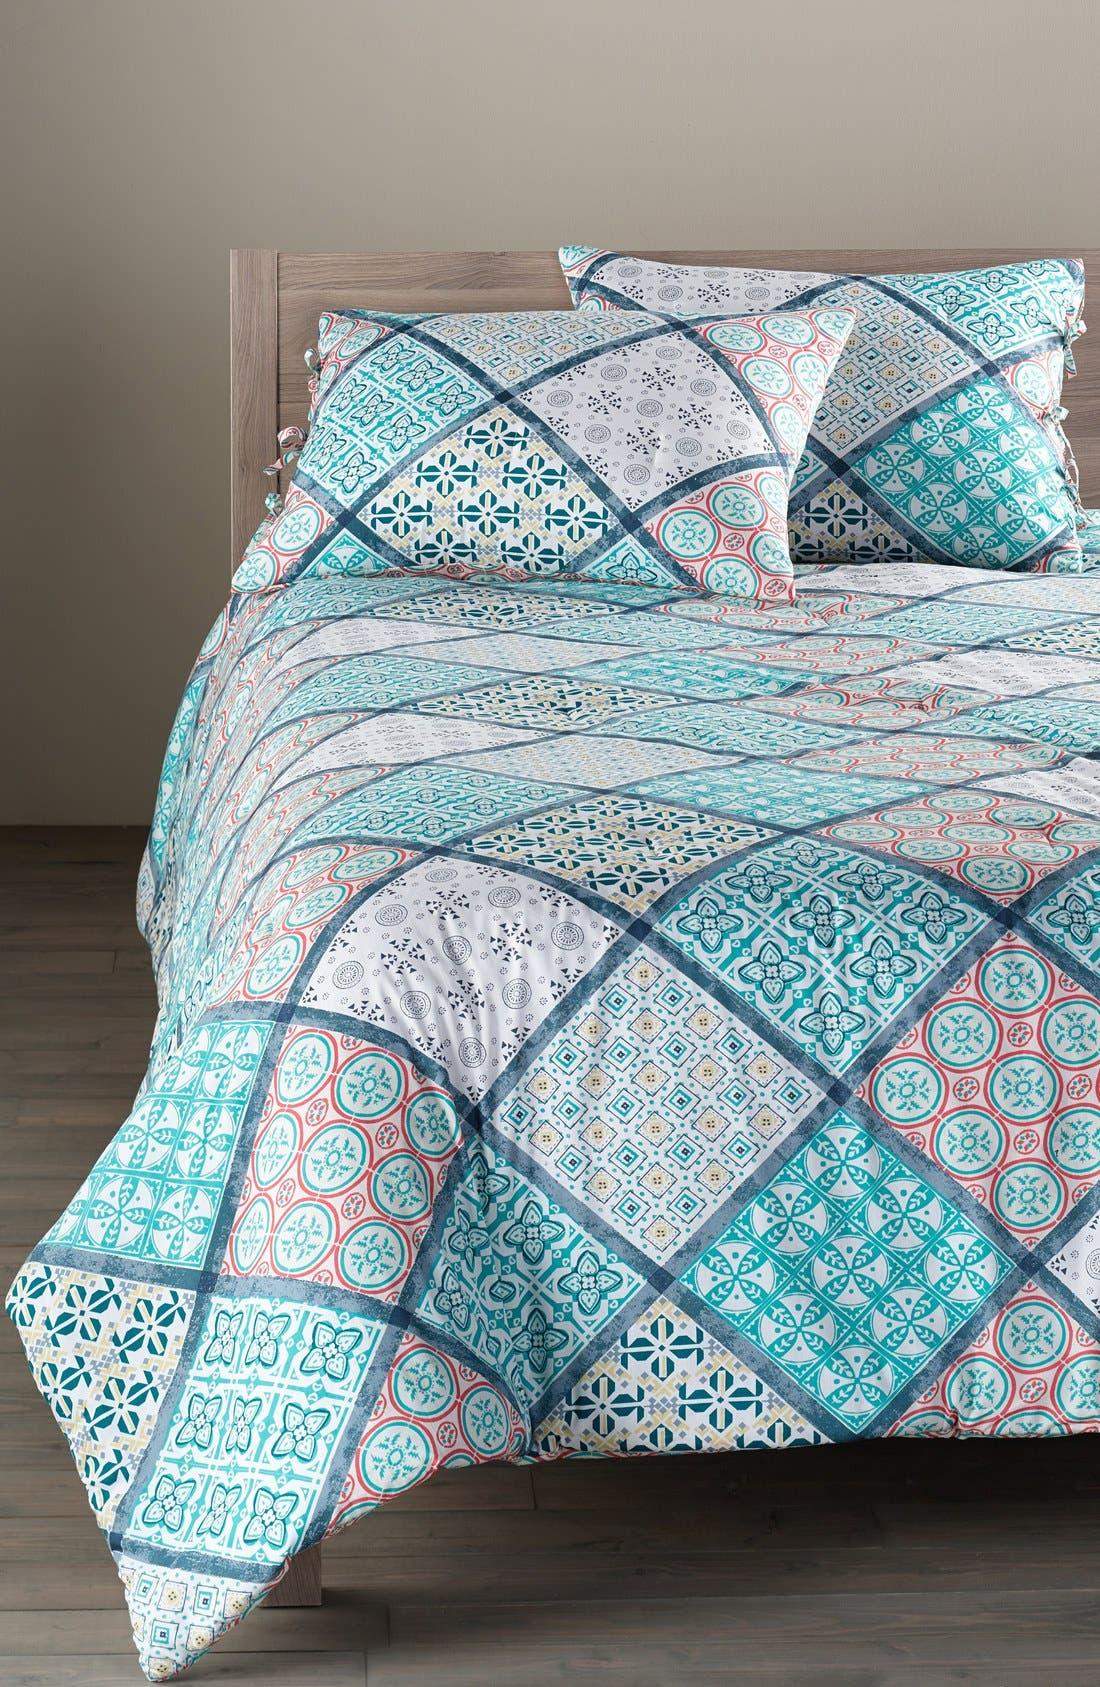 Alternate Image 1 Selected - Nordstrom at Home 'Mediterranean Tiles' Comforter